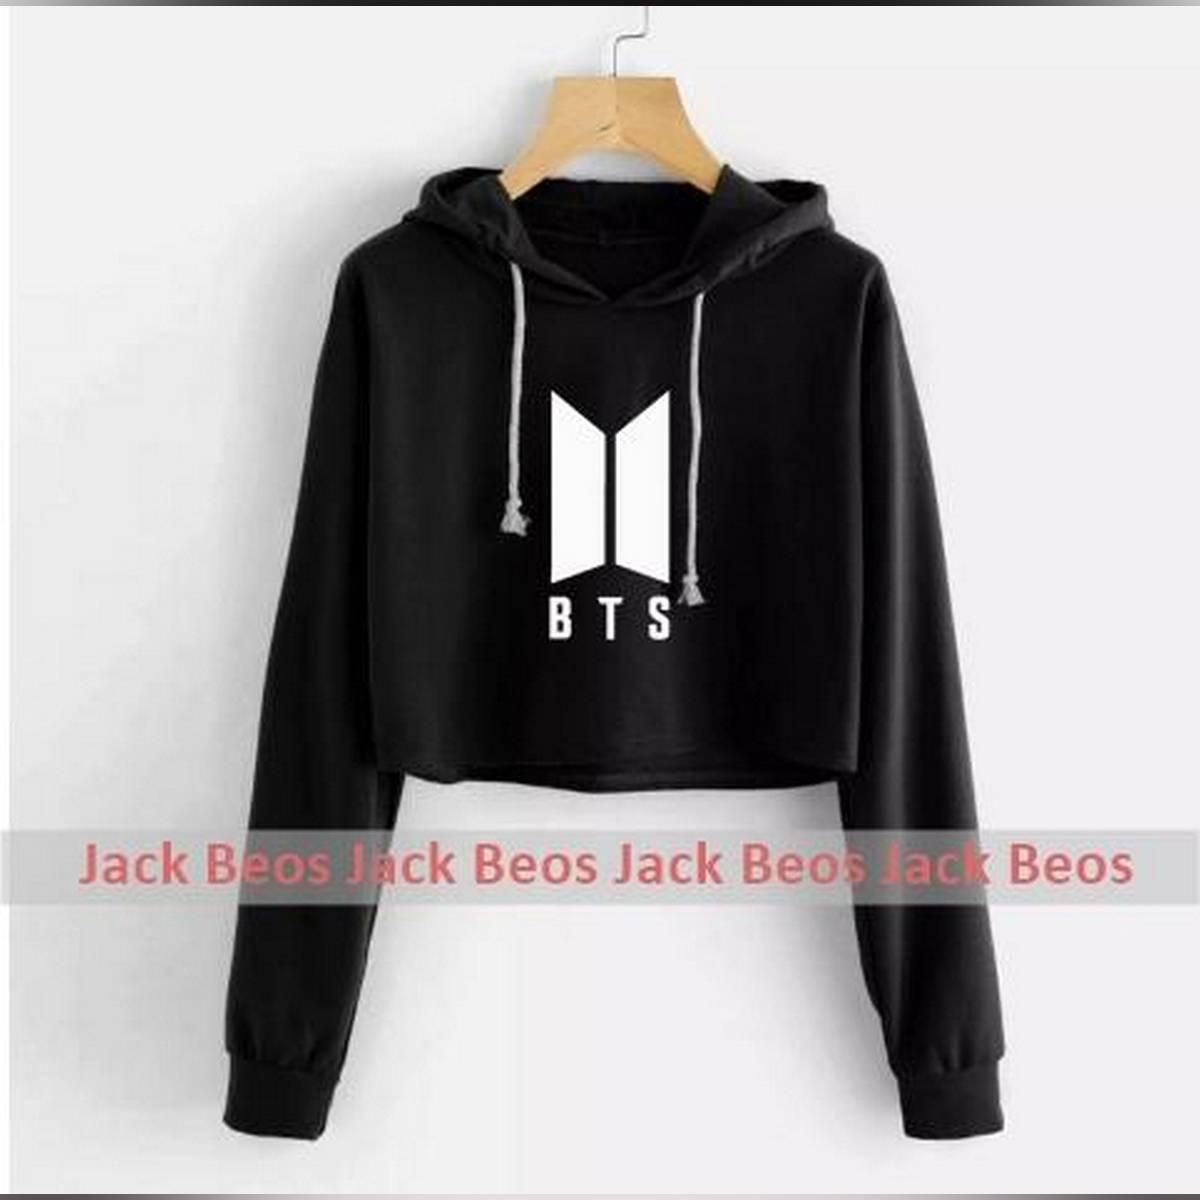 BTS Black Pullover Croped Hoodie For Women Long Sleeve